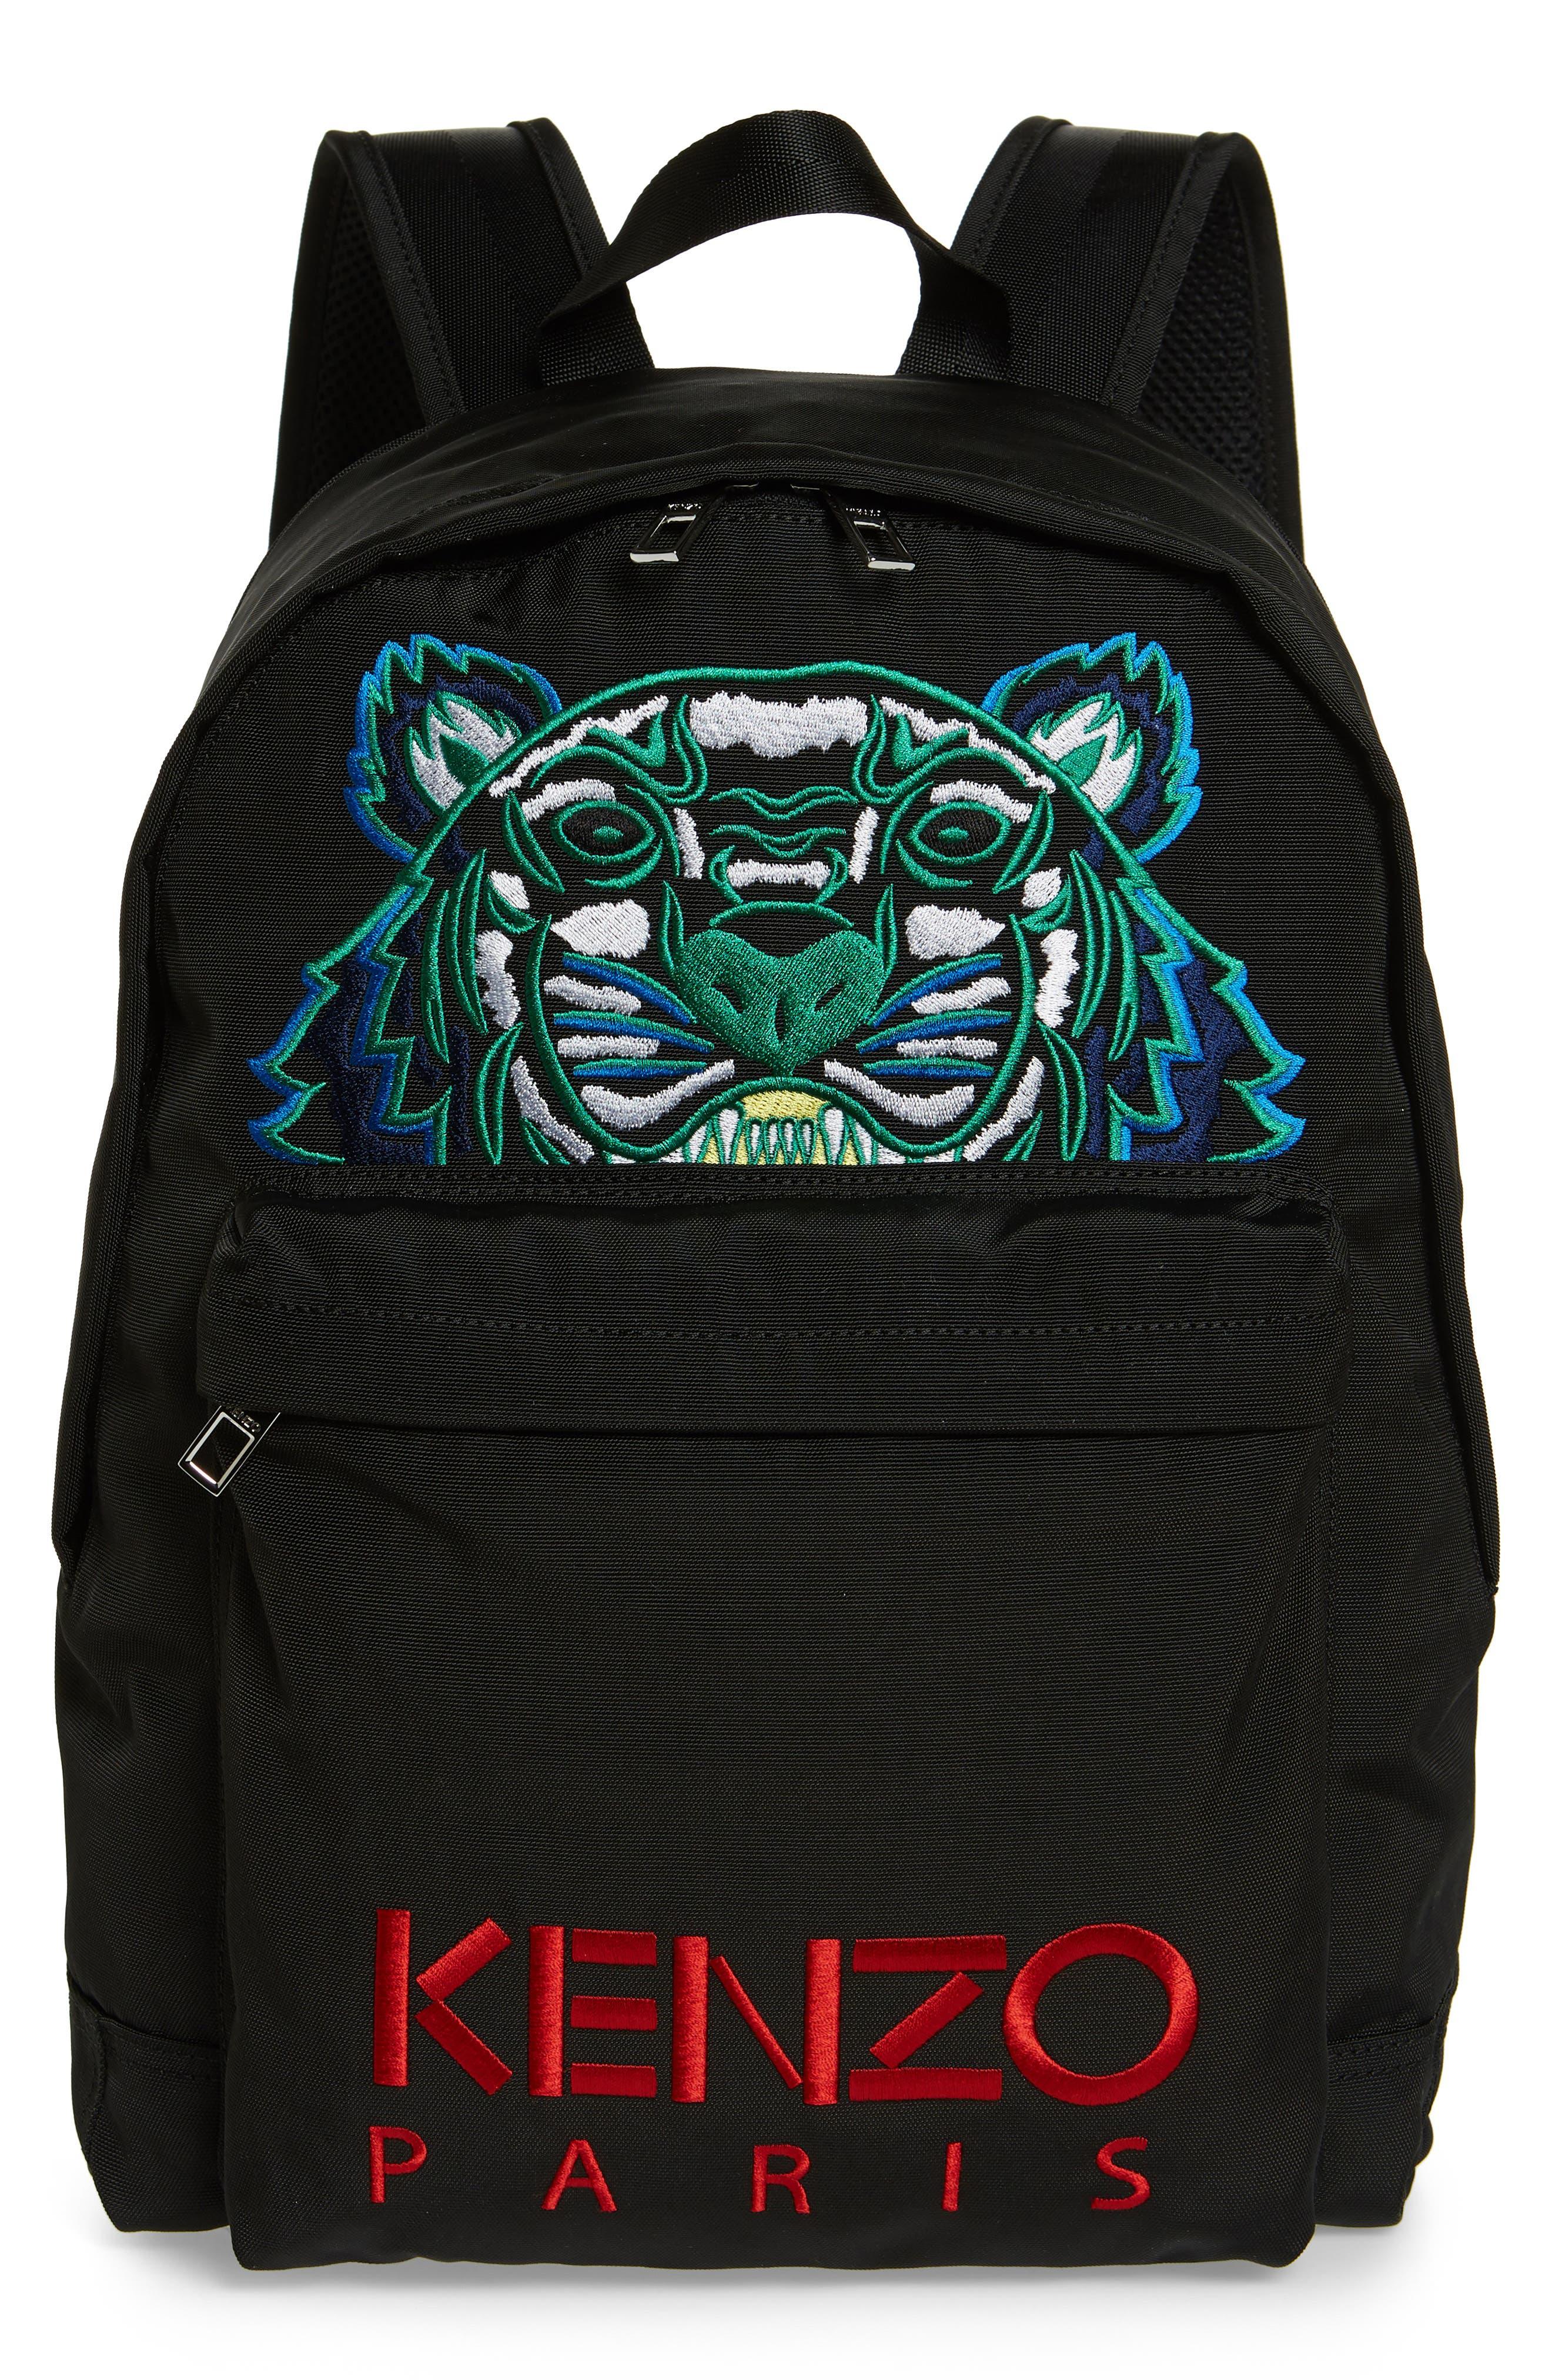 KENZO, Tiger Backpack, Main thumbnail 1, color, BLACK